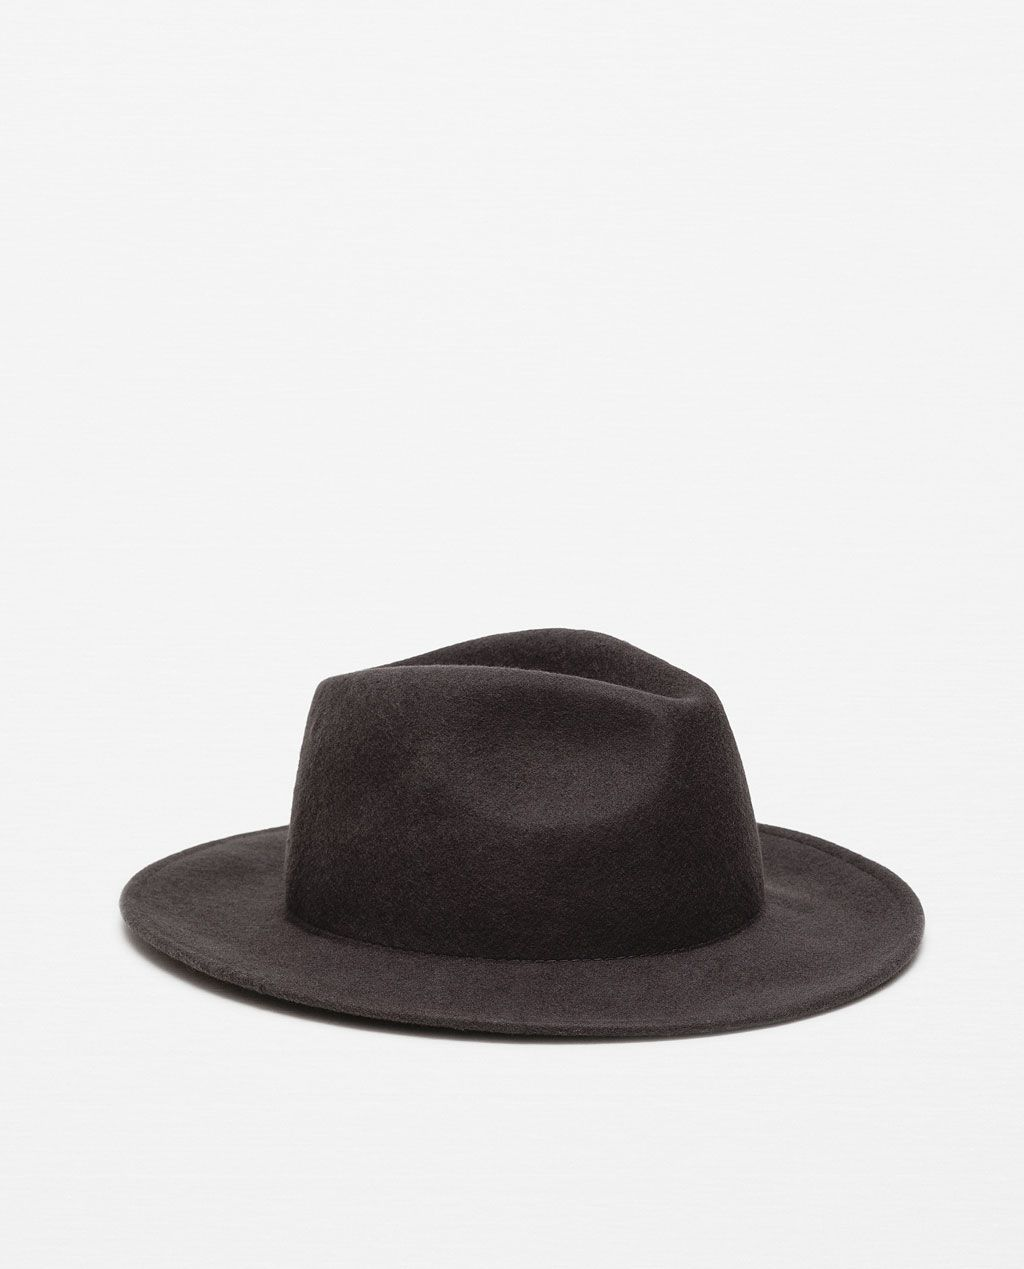 Wide Brim Felt Hat View All Accessories Man Wide Brim Felt Hat Hats For Men Hats